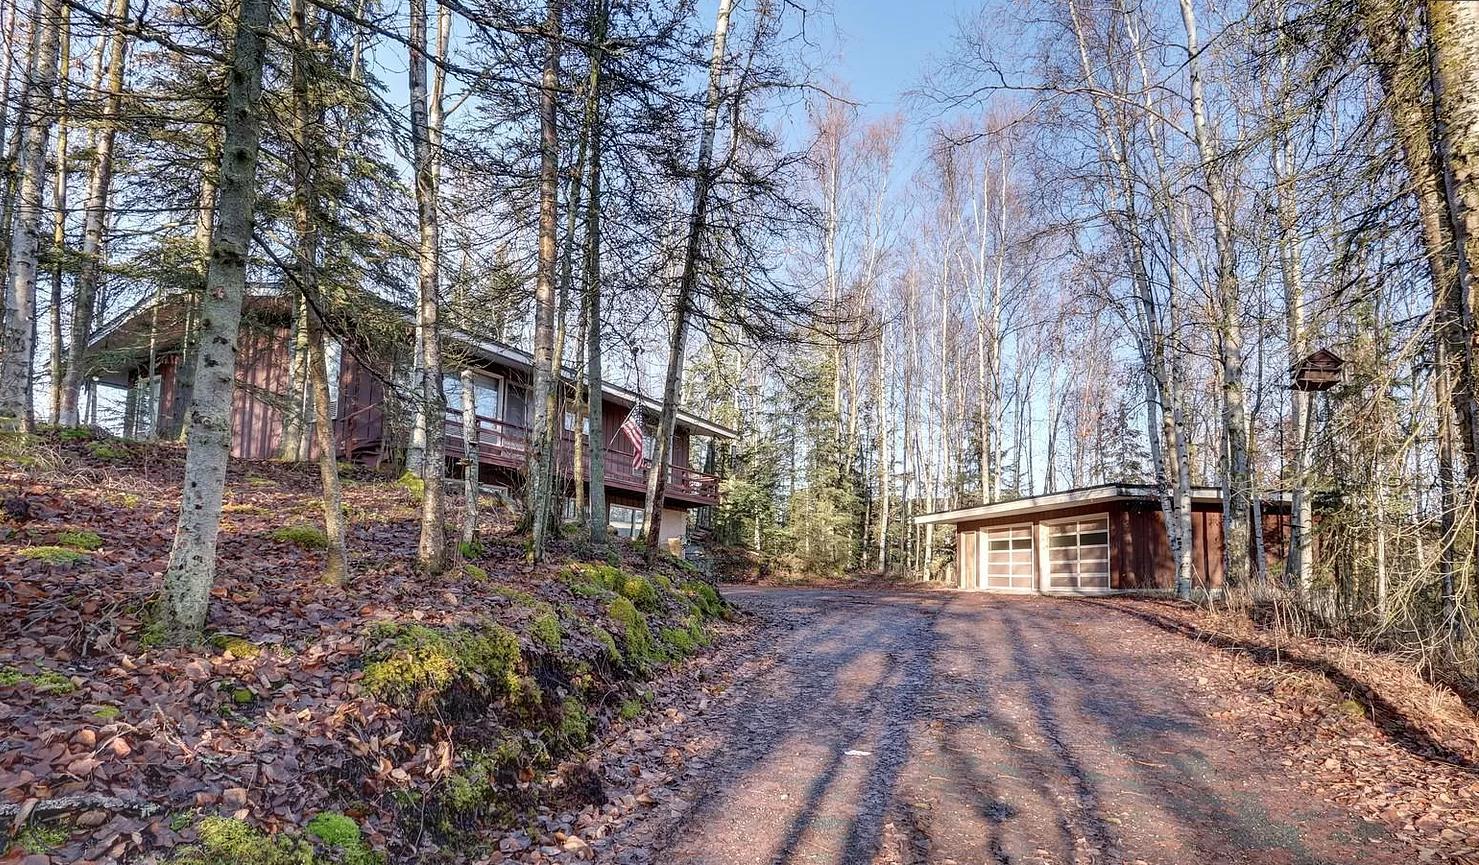 Mid-century estate home on 2 acres asks $595K